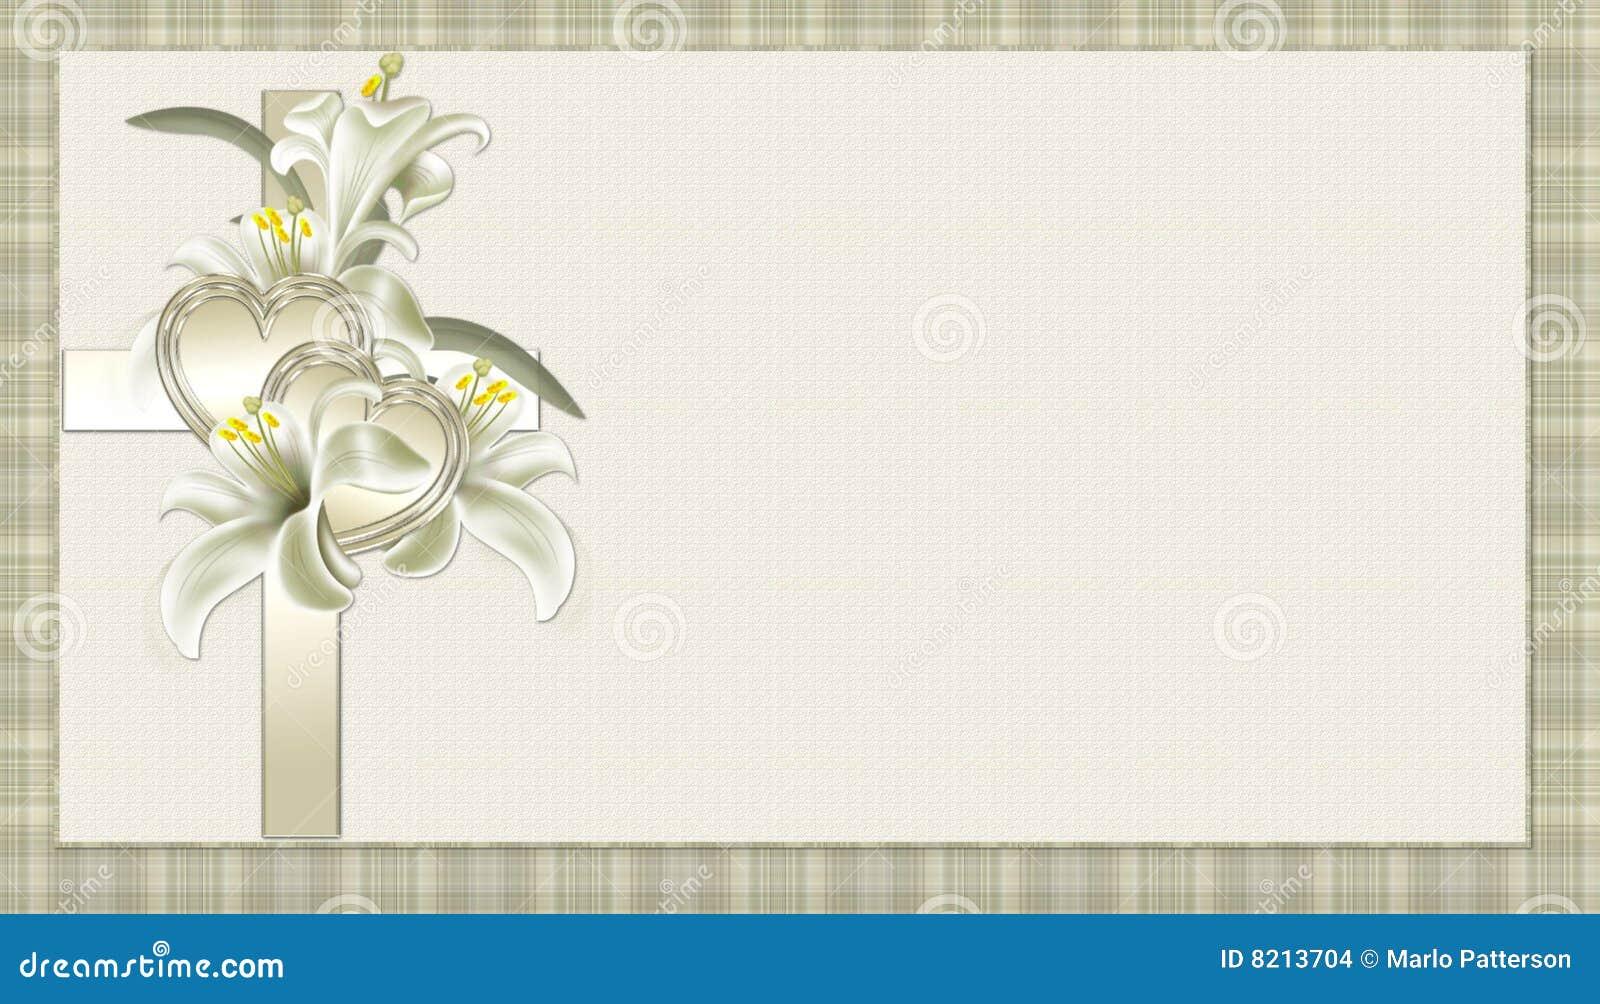 Invitation Cards Templates for best invitation design